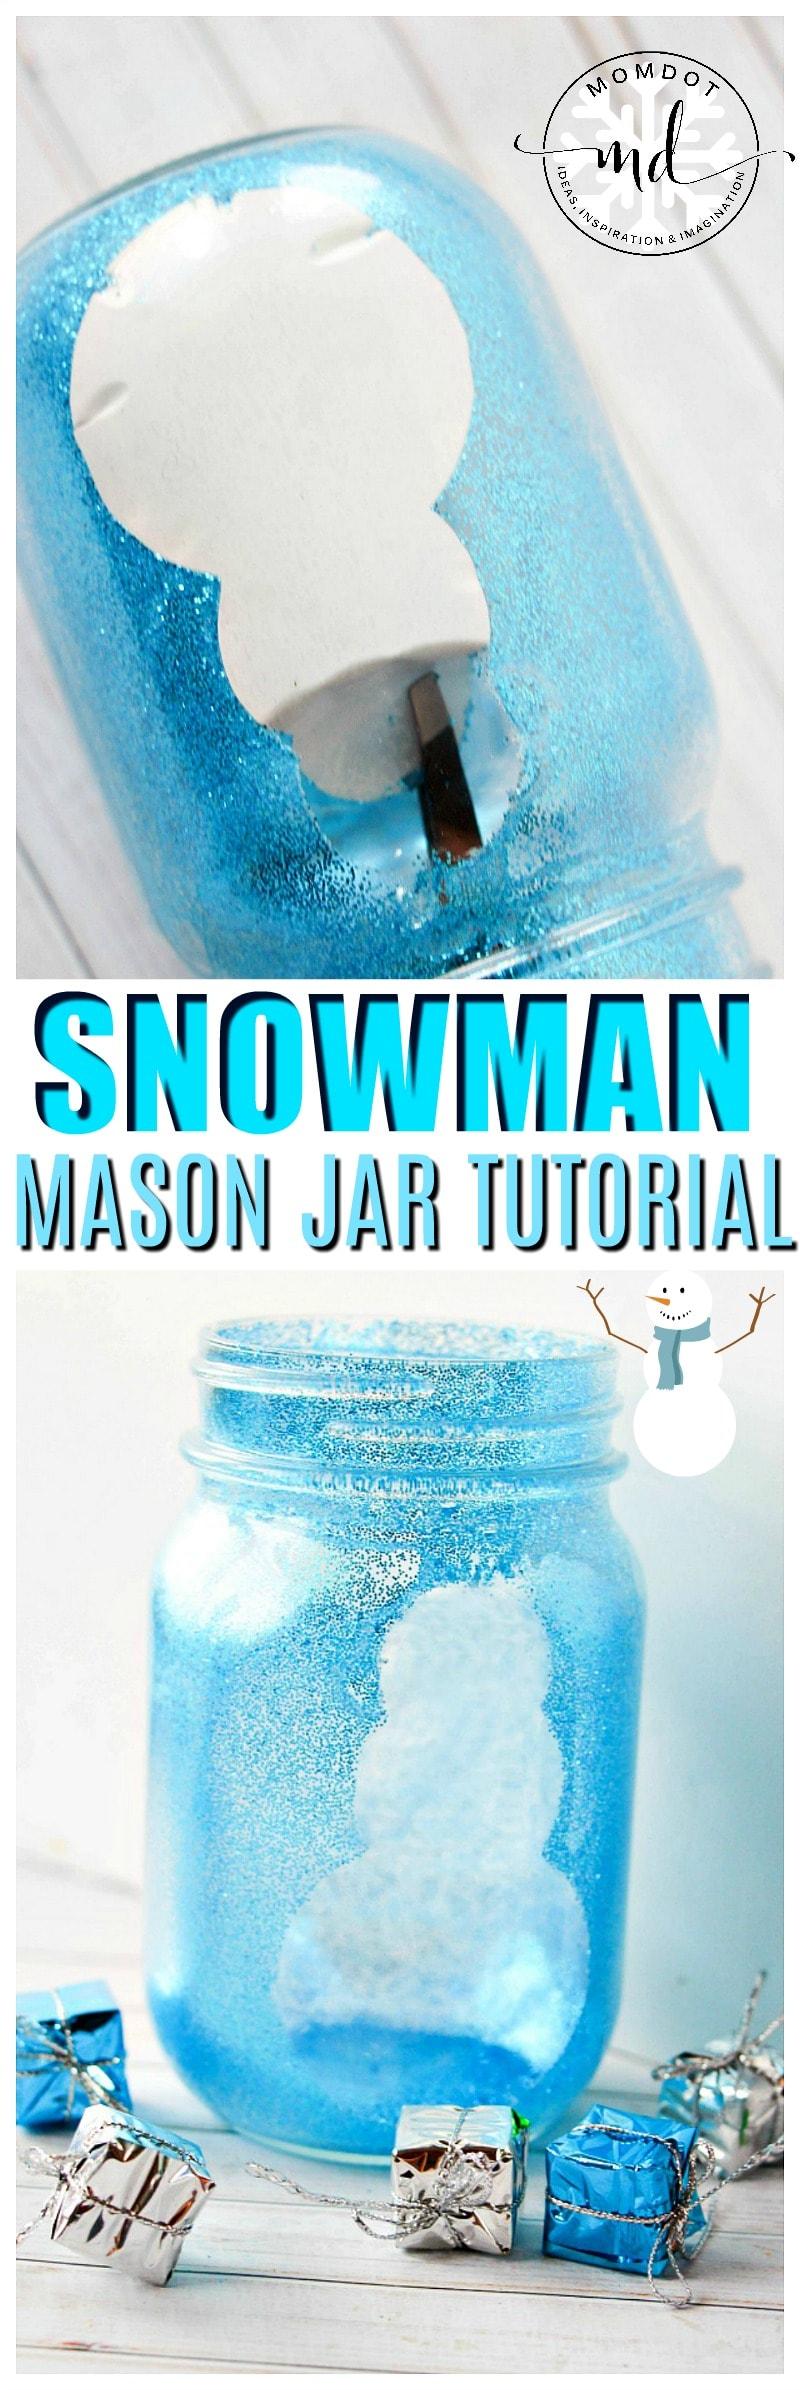 Snowman Mason Jar Crafts Christmas Mason Jar Idea